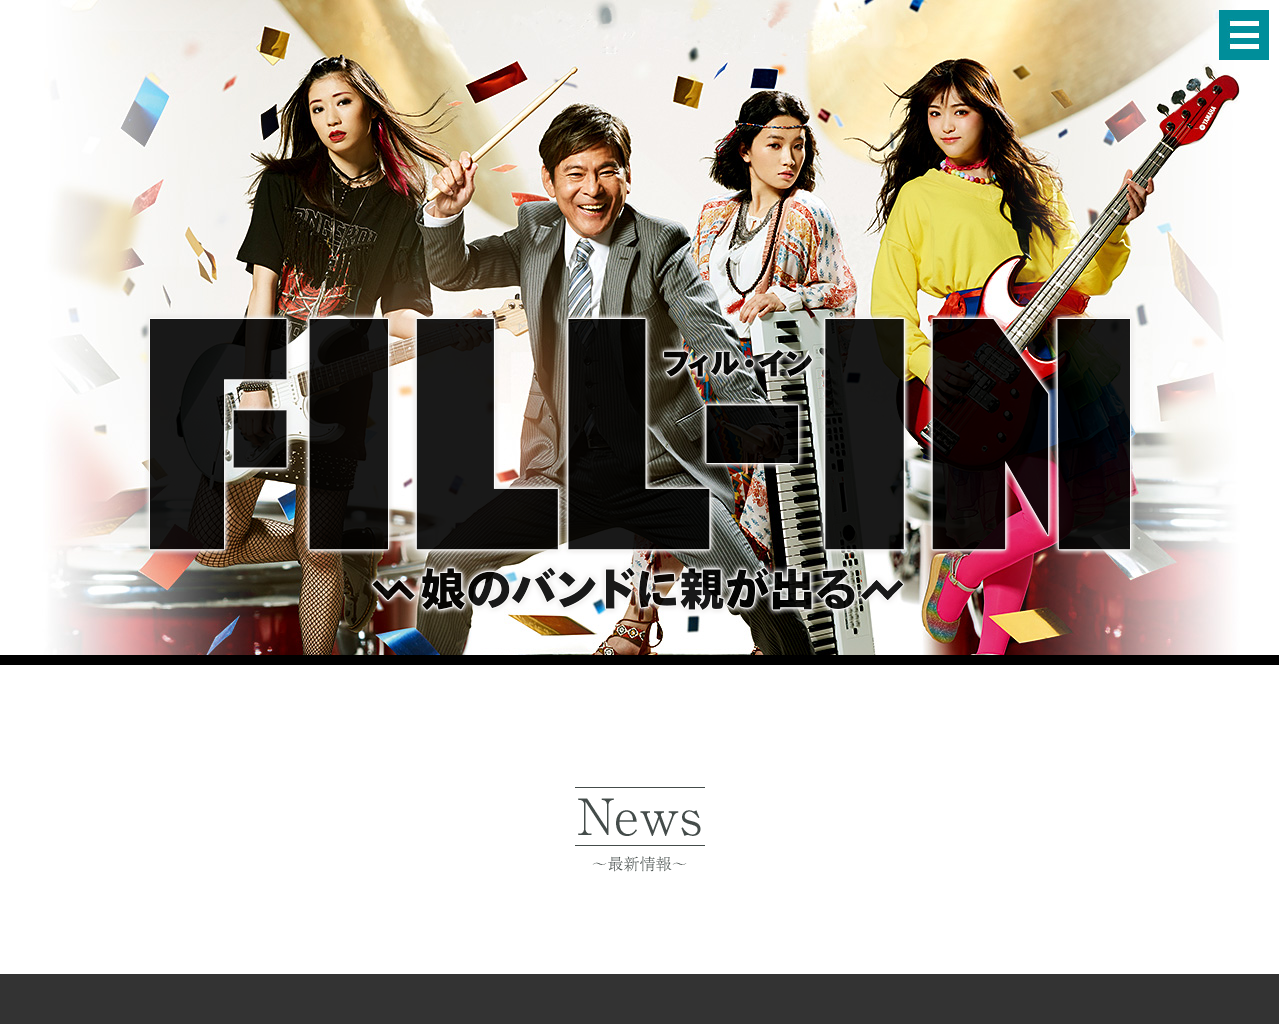 fill-in.yoshimoto.co.jp(2018/01/13 11:00:39)